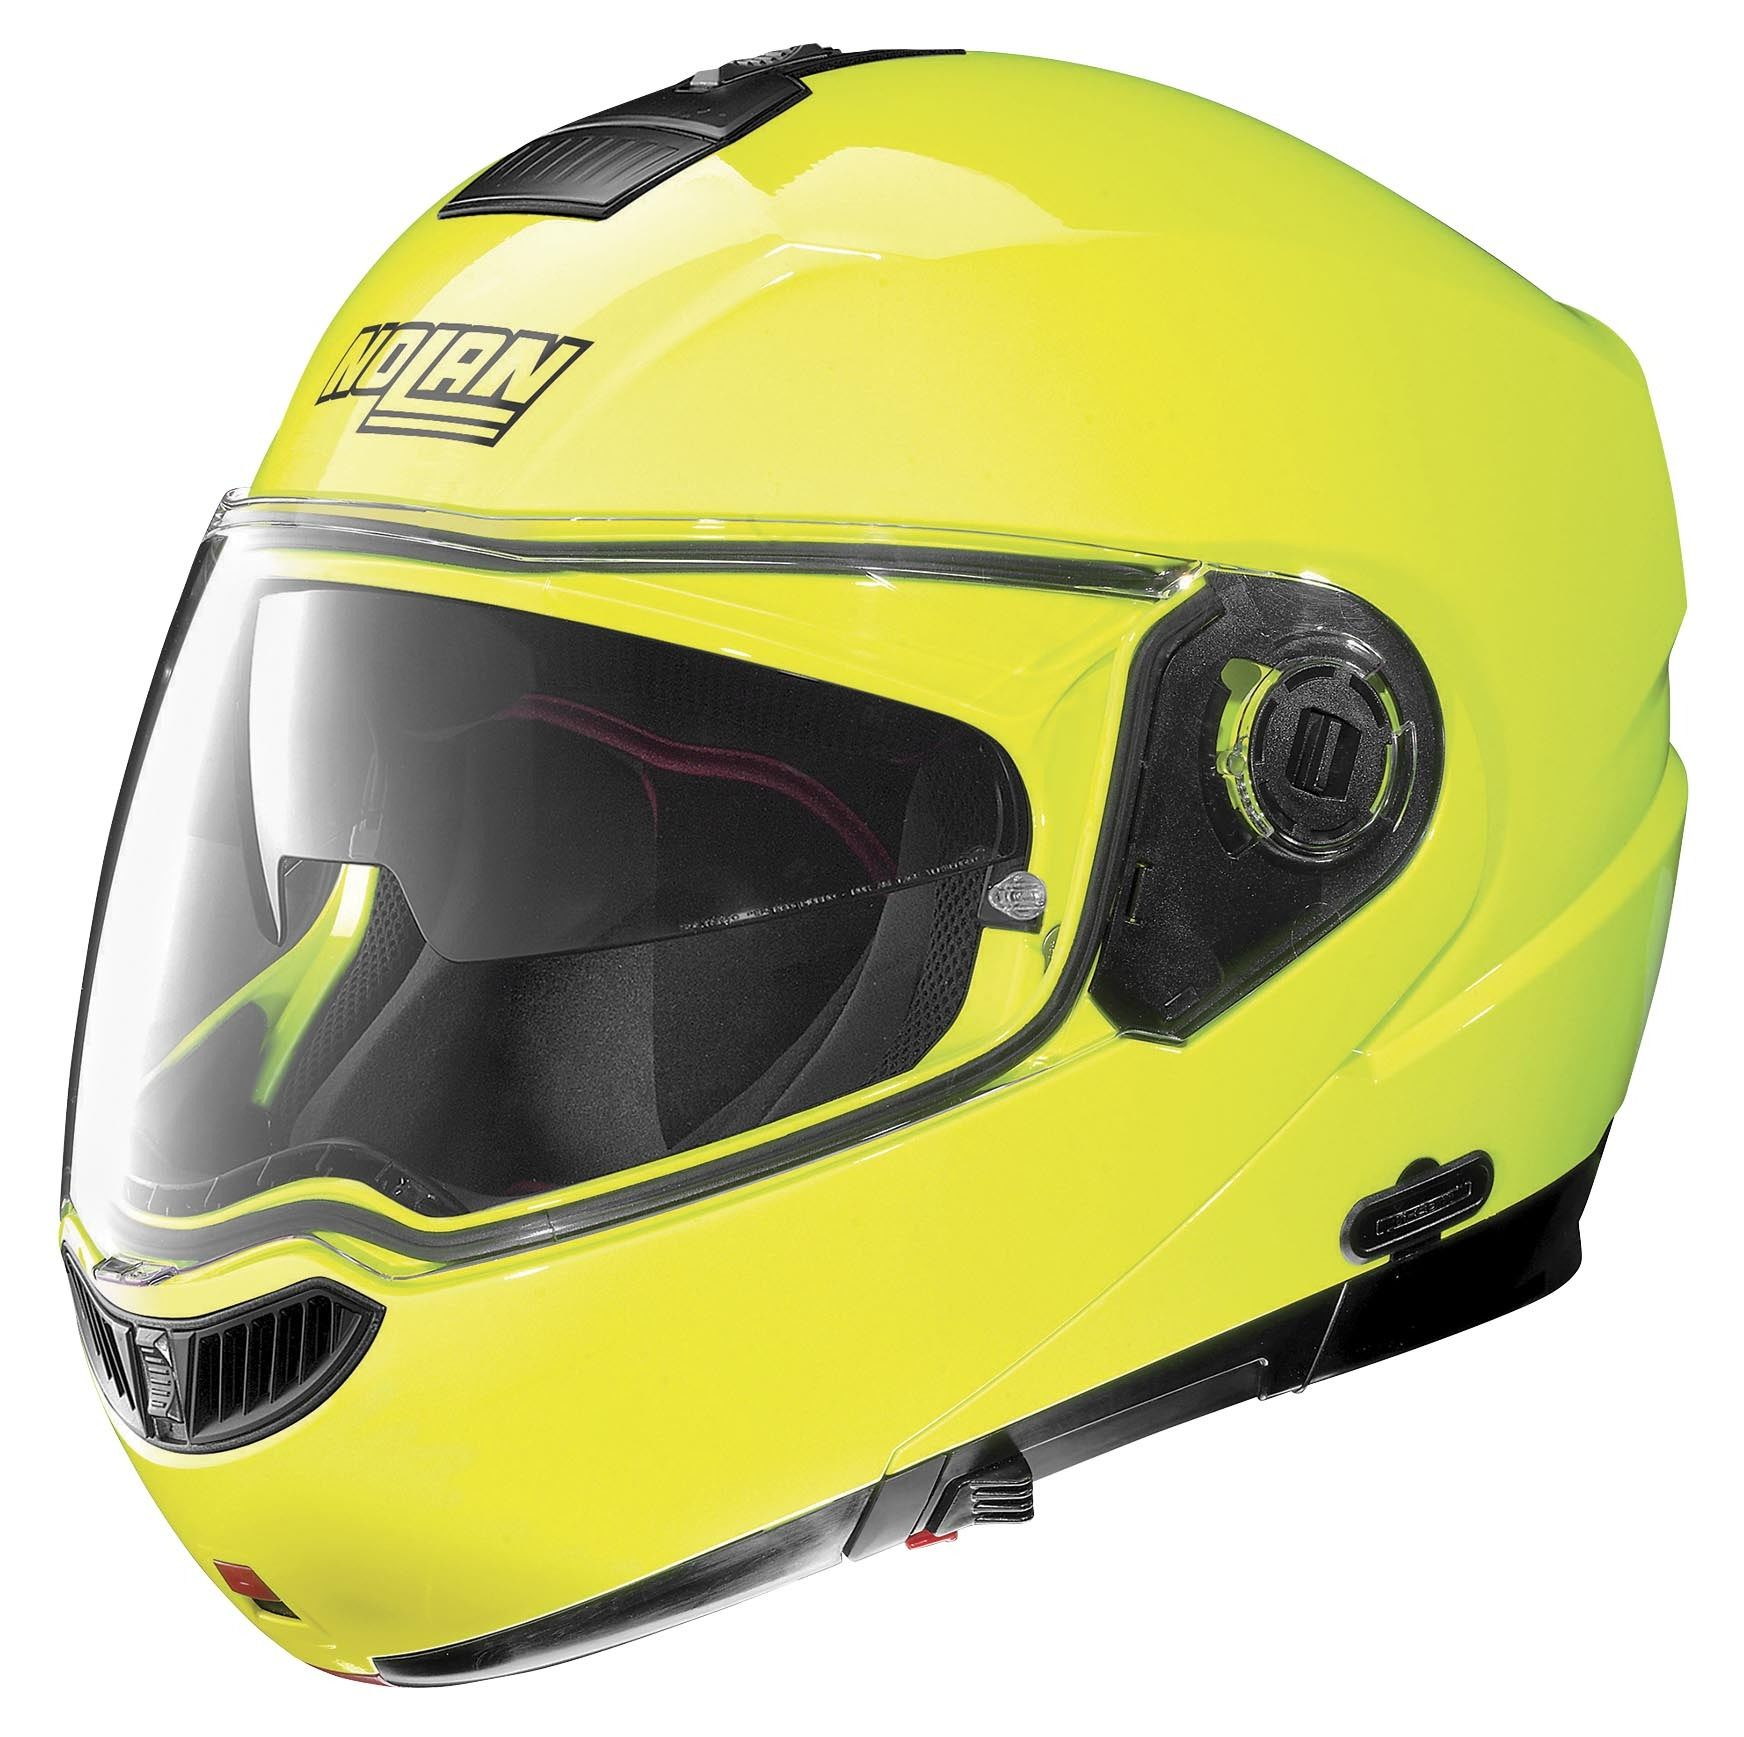 Nolan N104 Evo Hi Viz Helmet 20 105 99 Off Revzilla